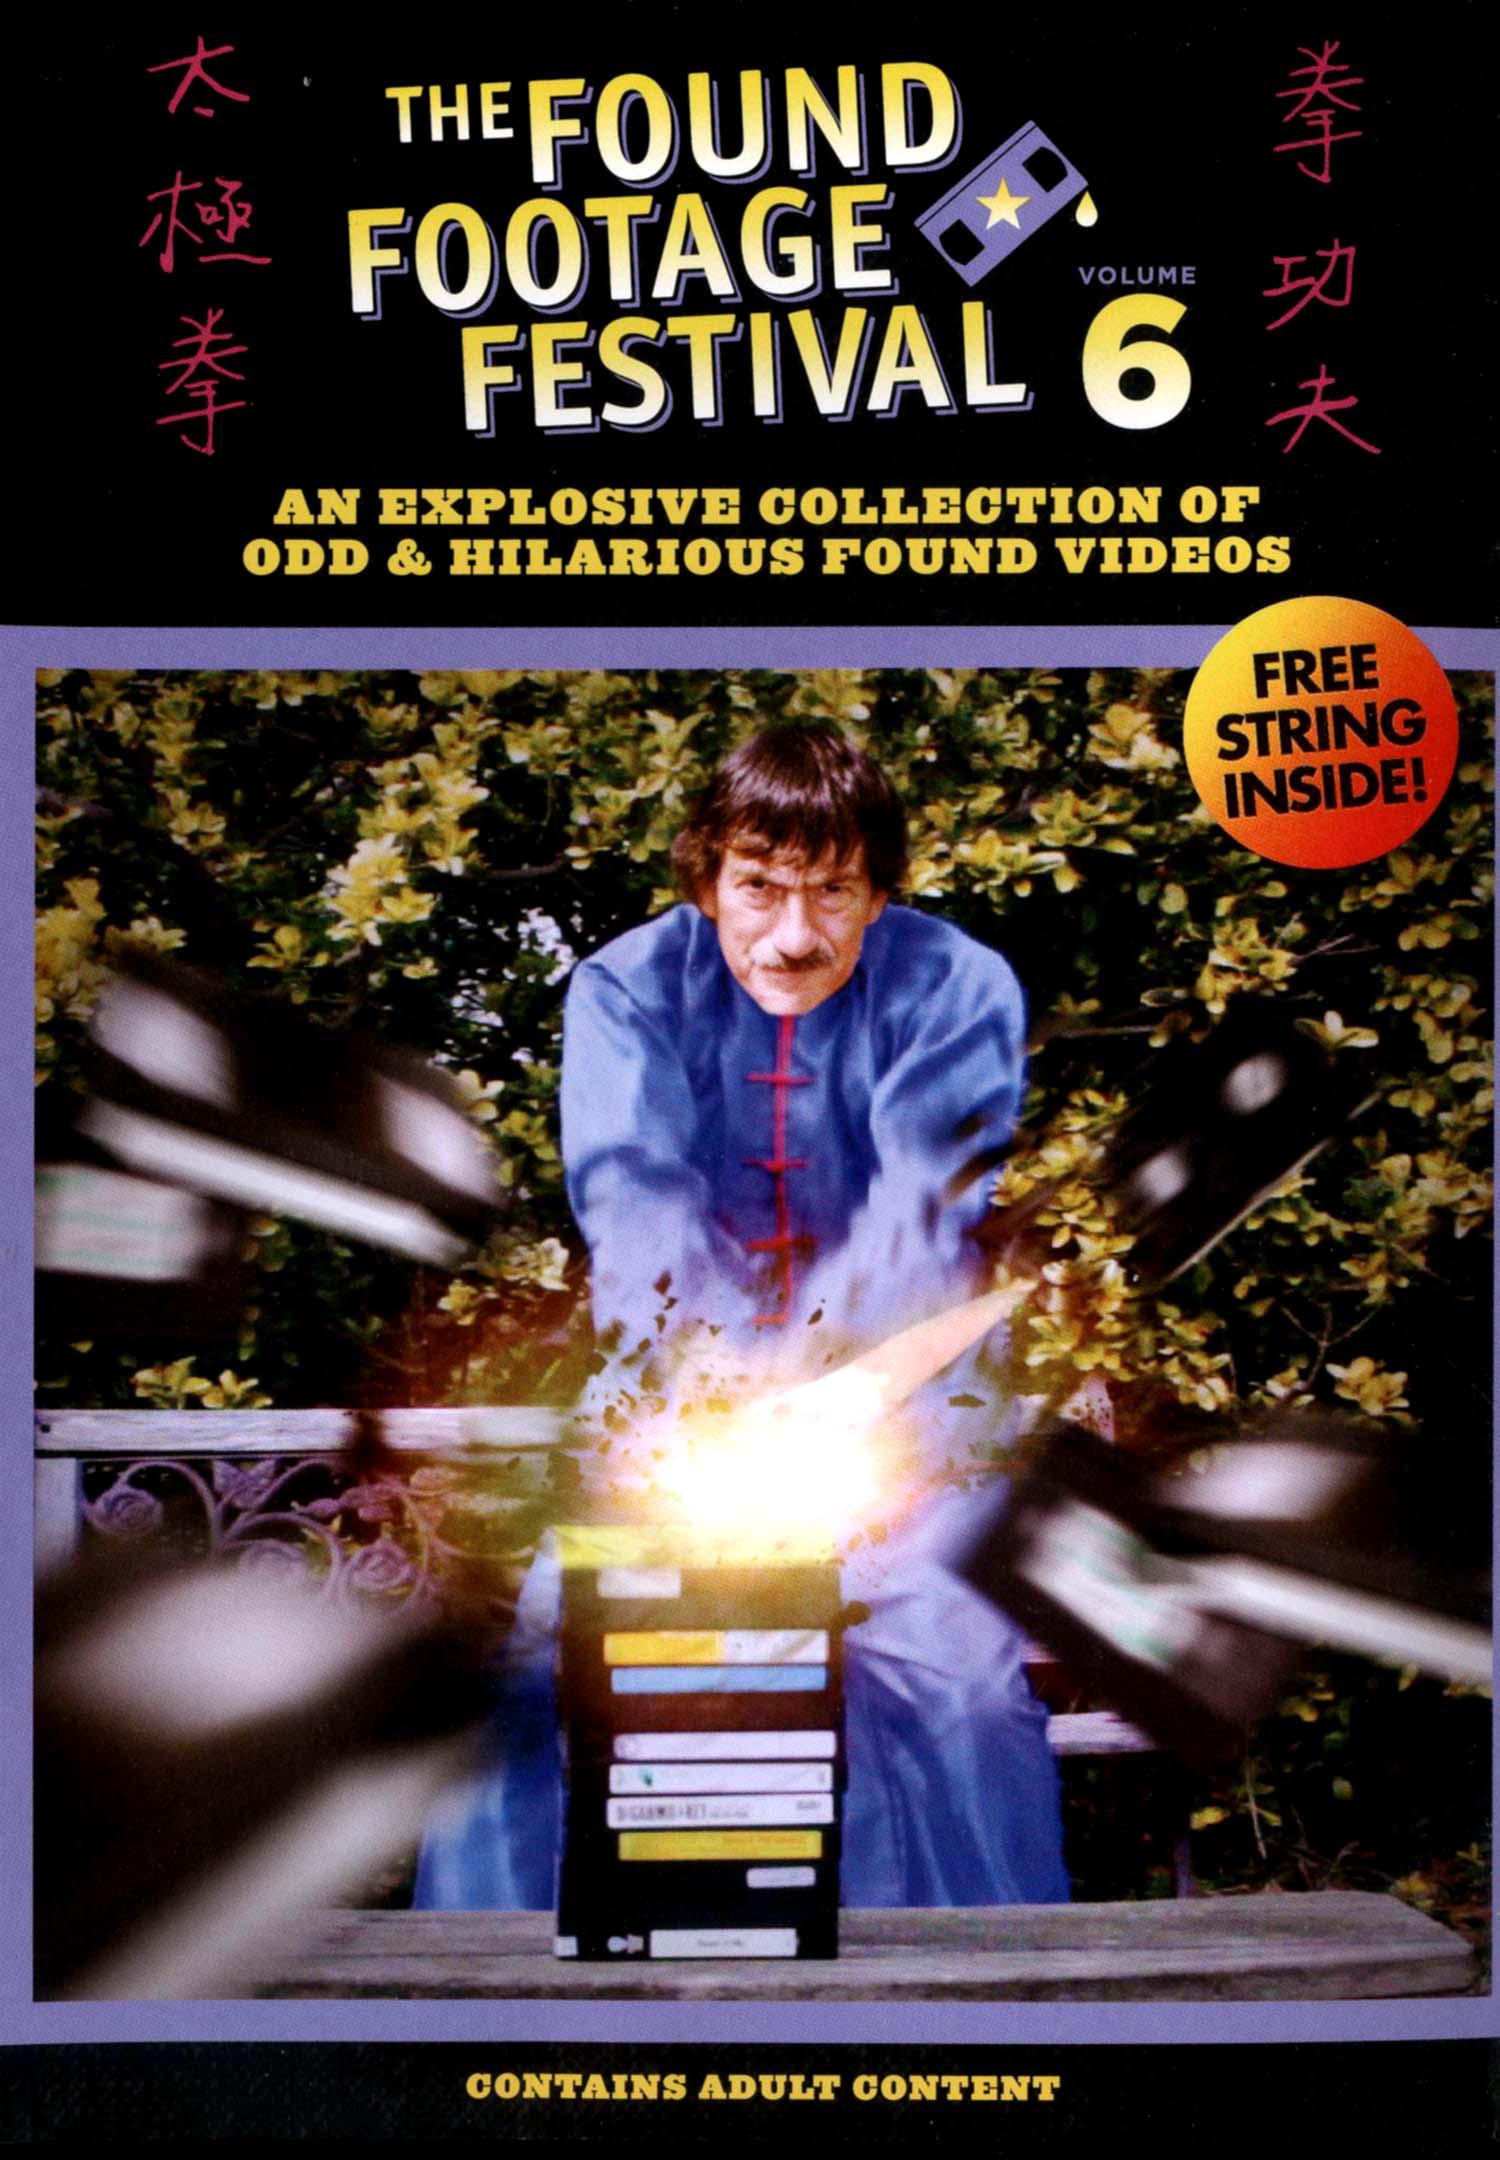 The Found Footage Festival, Vol. 6